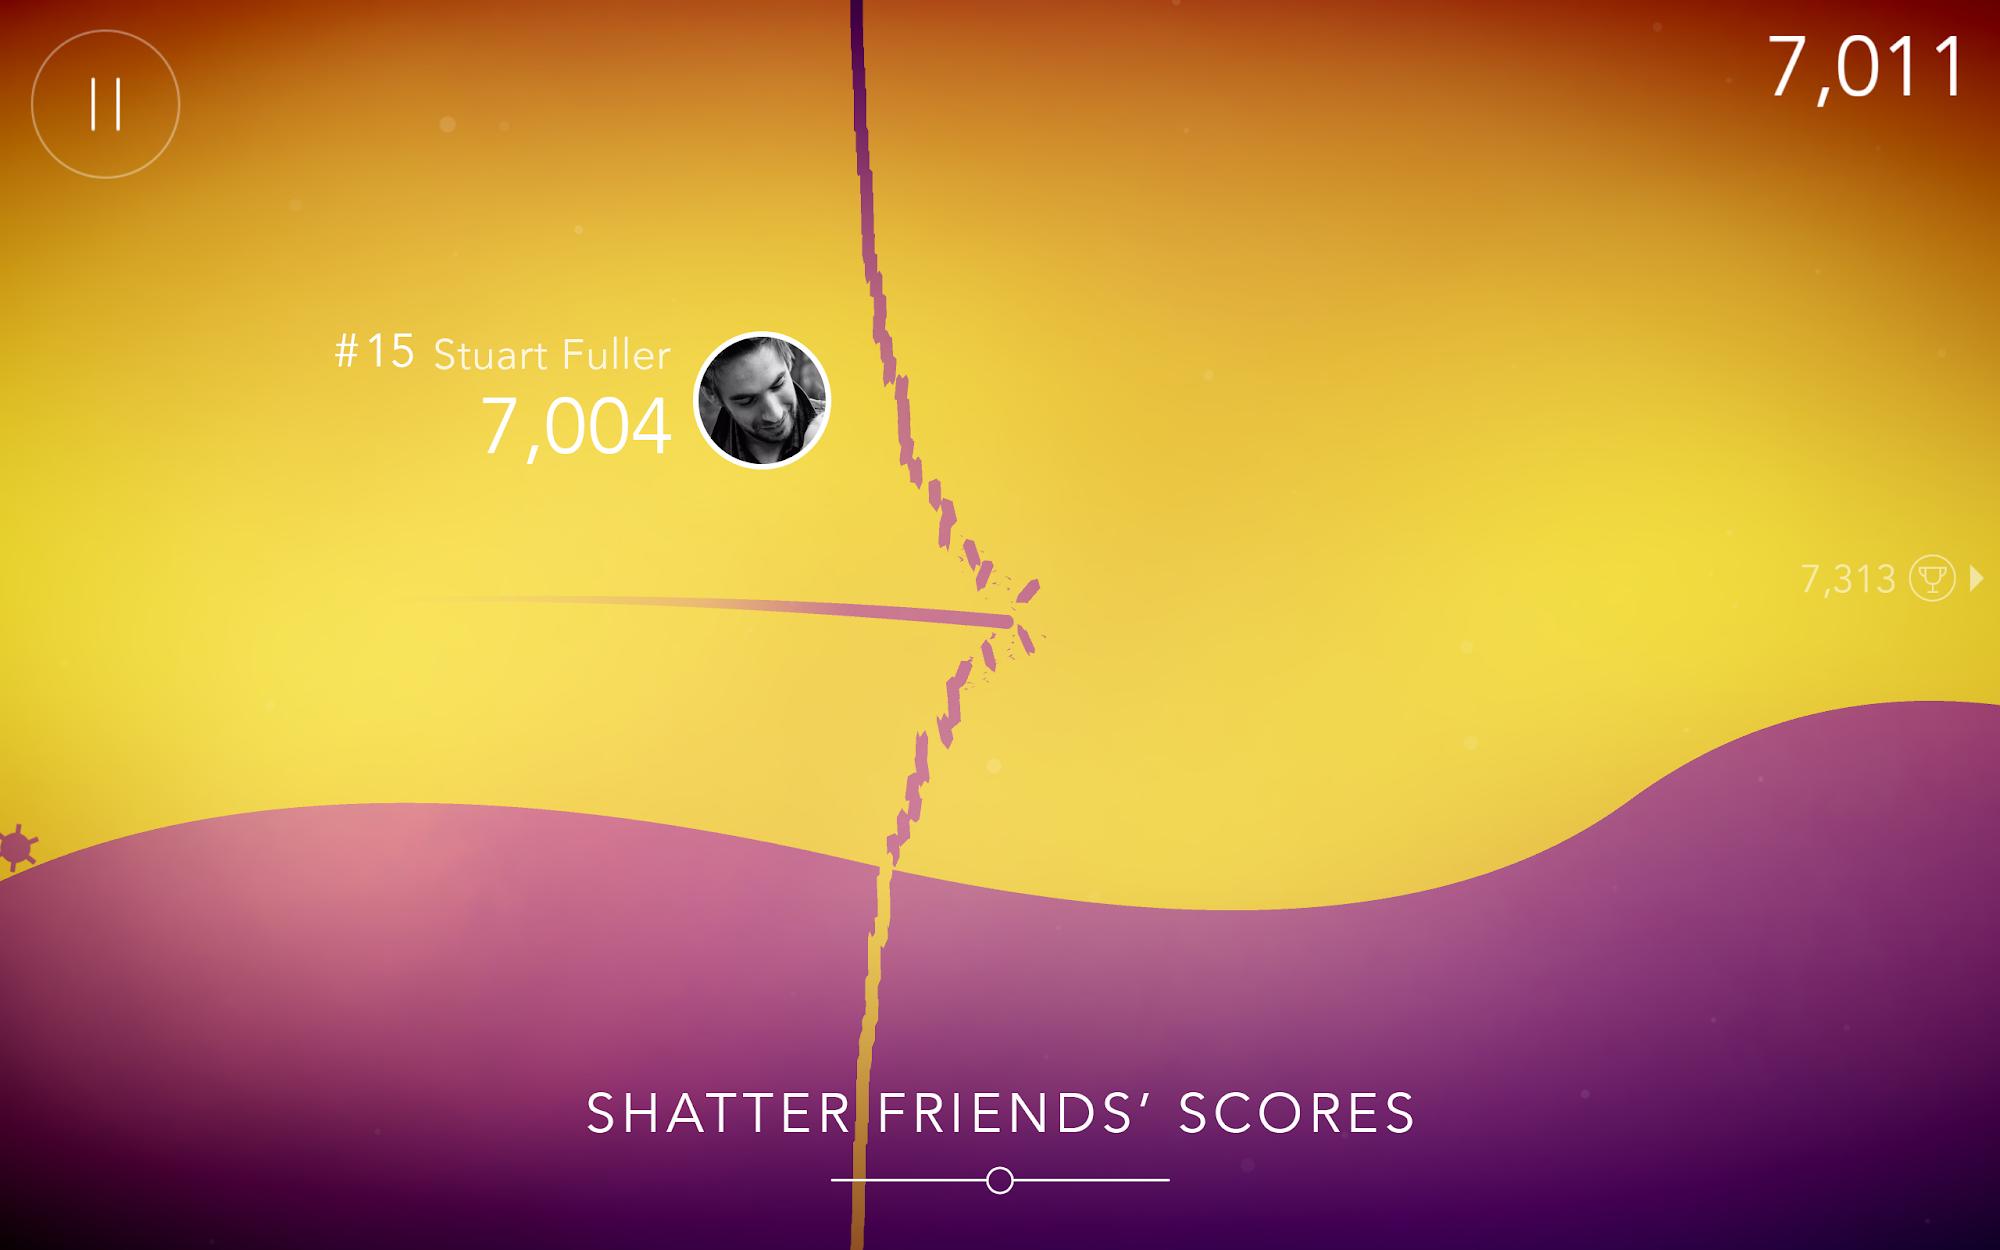 FLO Game - Free challenging infinite runner screenshot #1